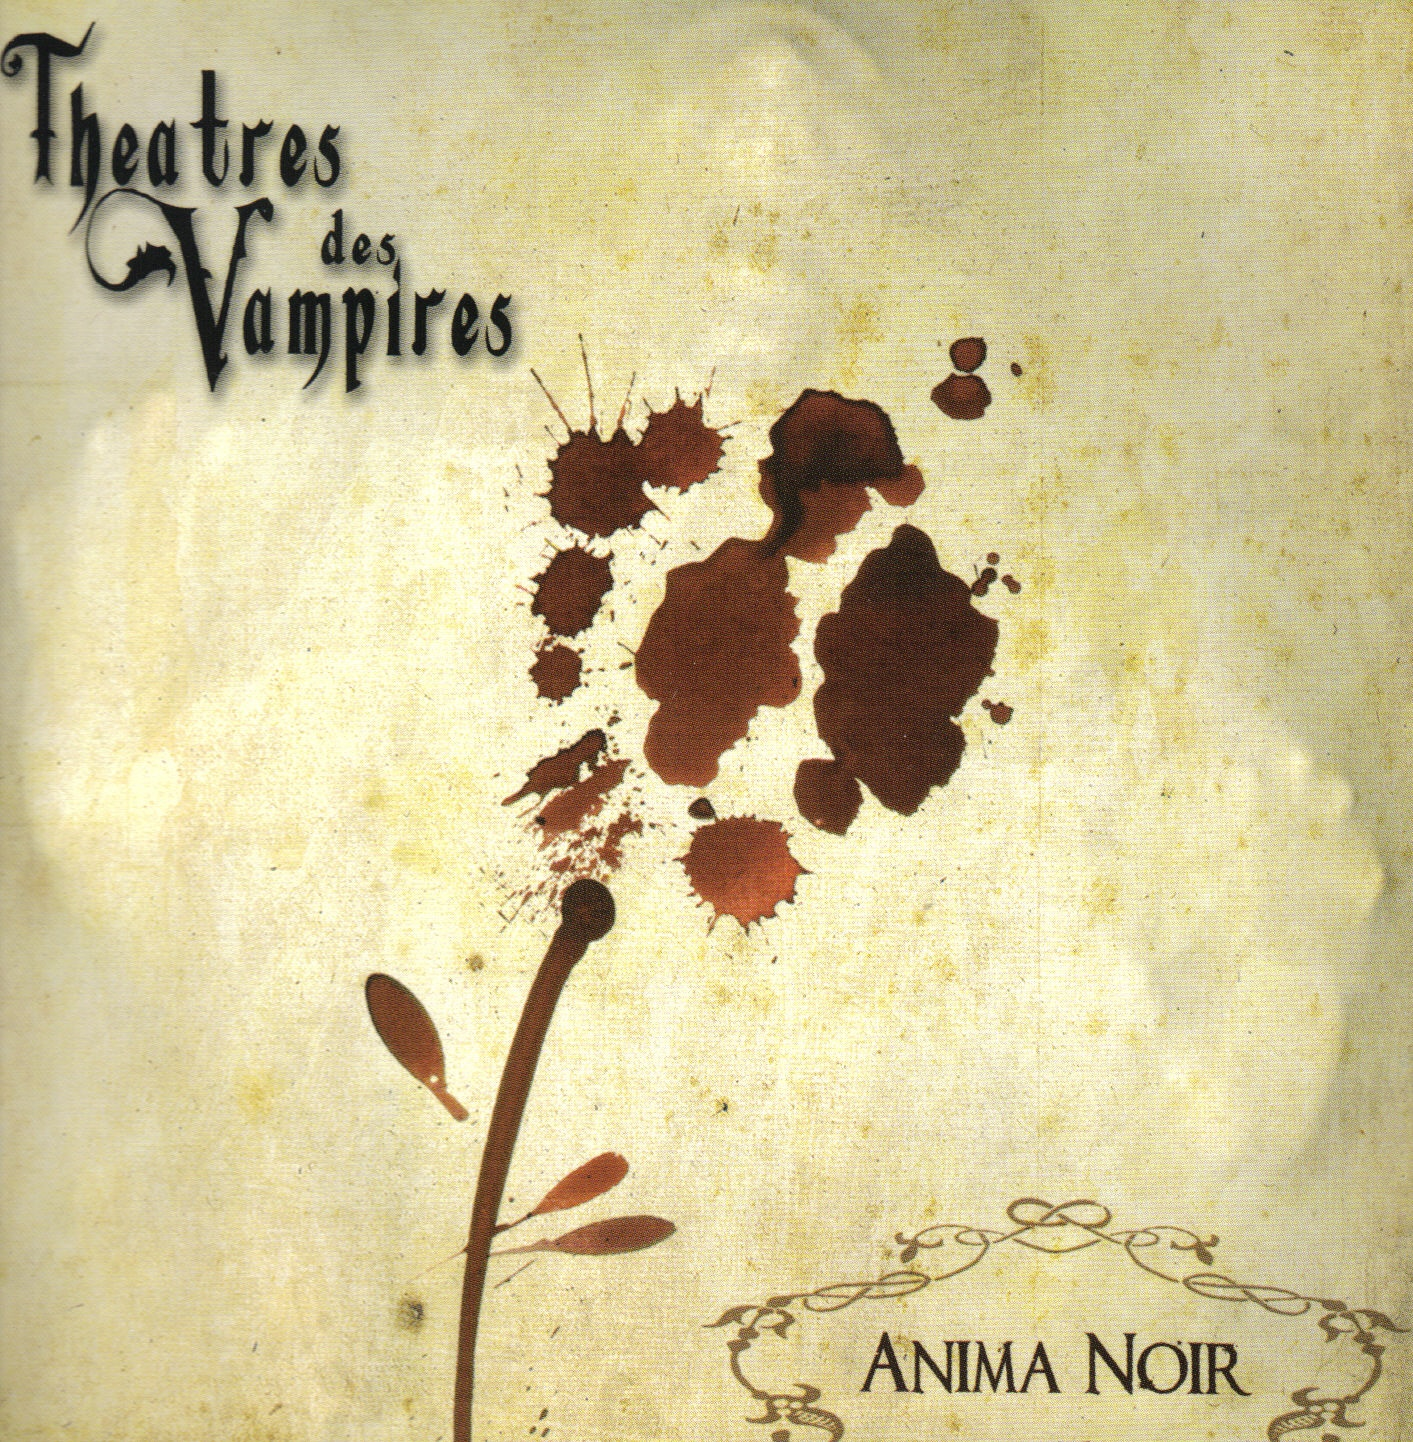 THEATRES DES VAMPIRES Anima Noir